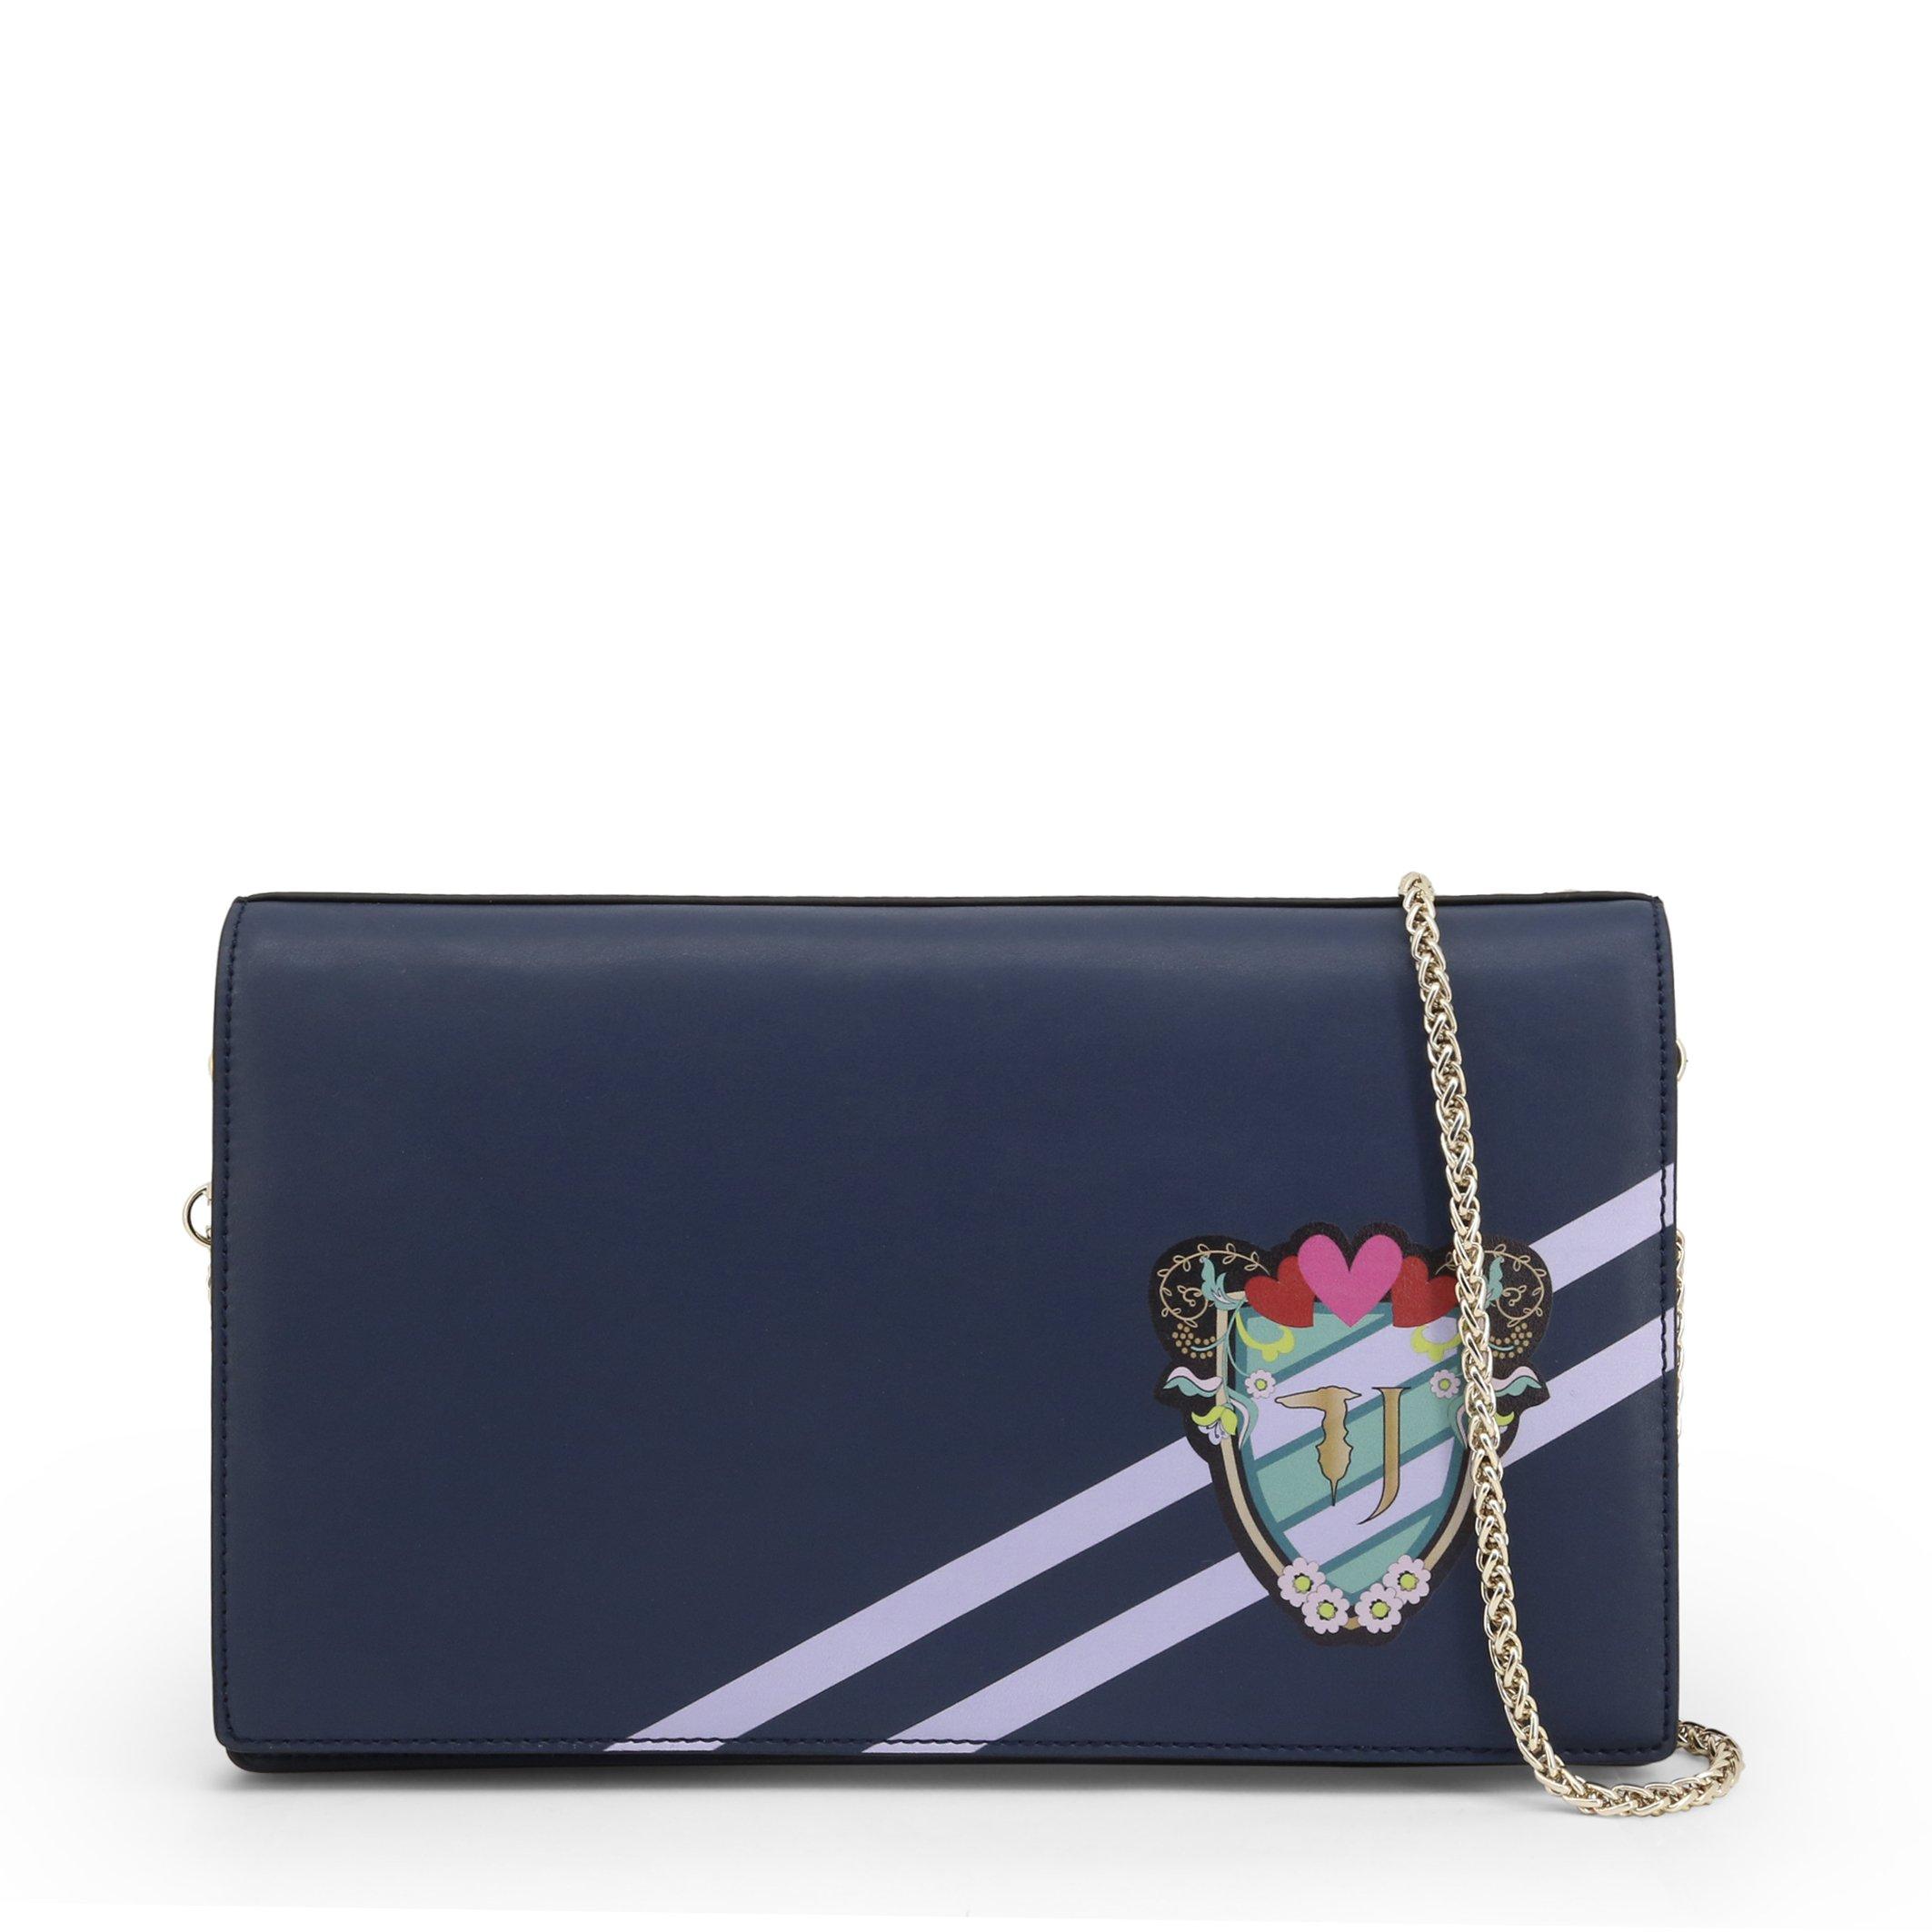 Trussardi Women's Clutch Bag Various Colours CUMINO_75B00413 - blue NOSIZE